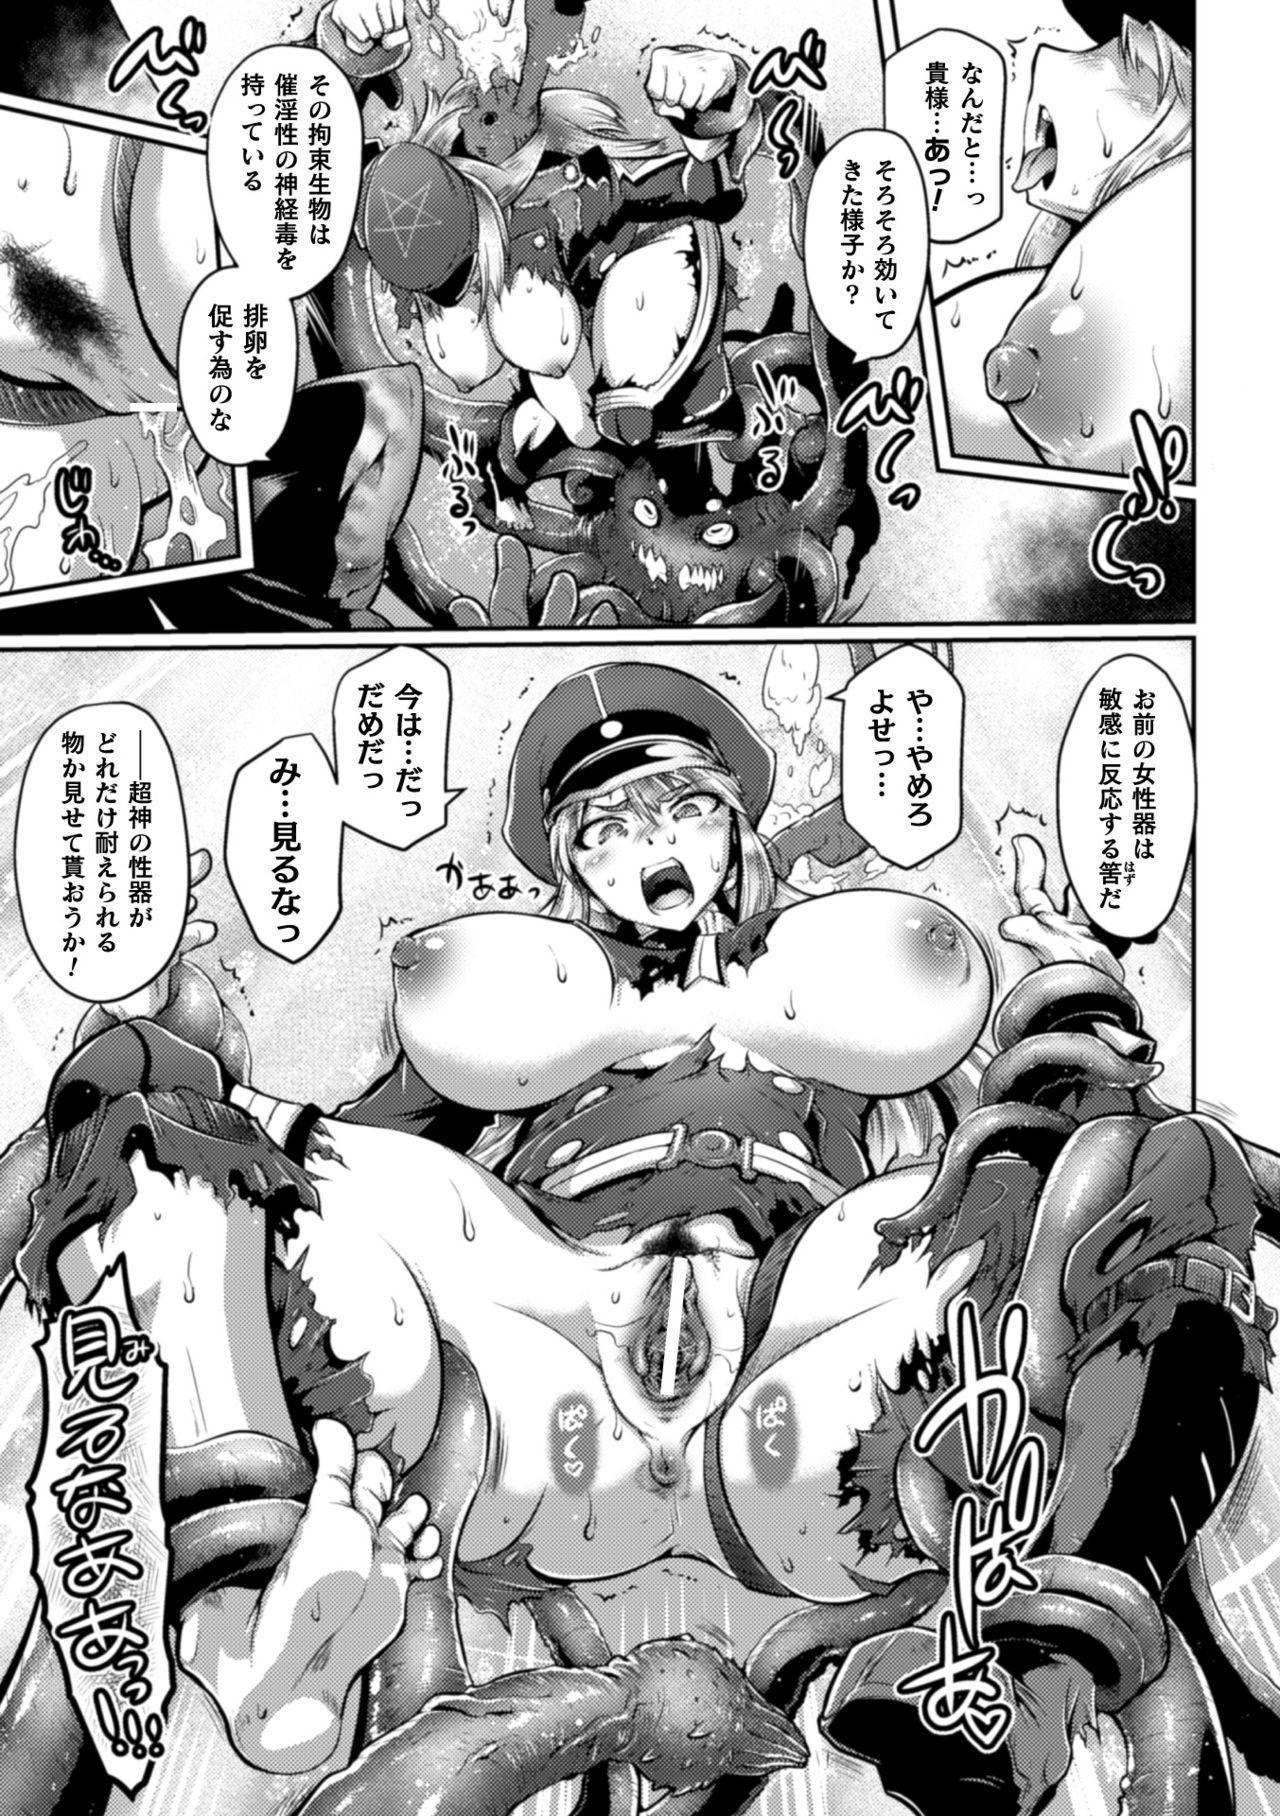 2D Comic Magazine Capsule Kan Seigi no Heroine Mesu Ochi Jikken! Vol. 2 8